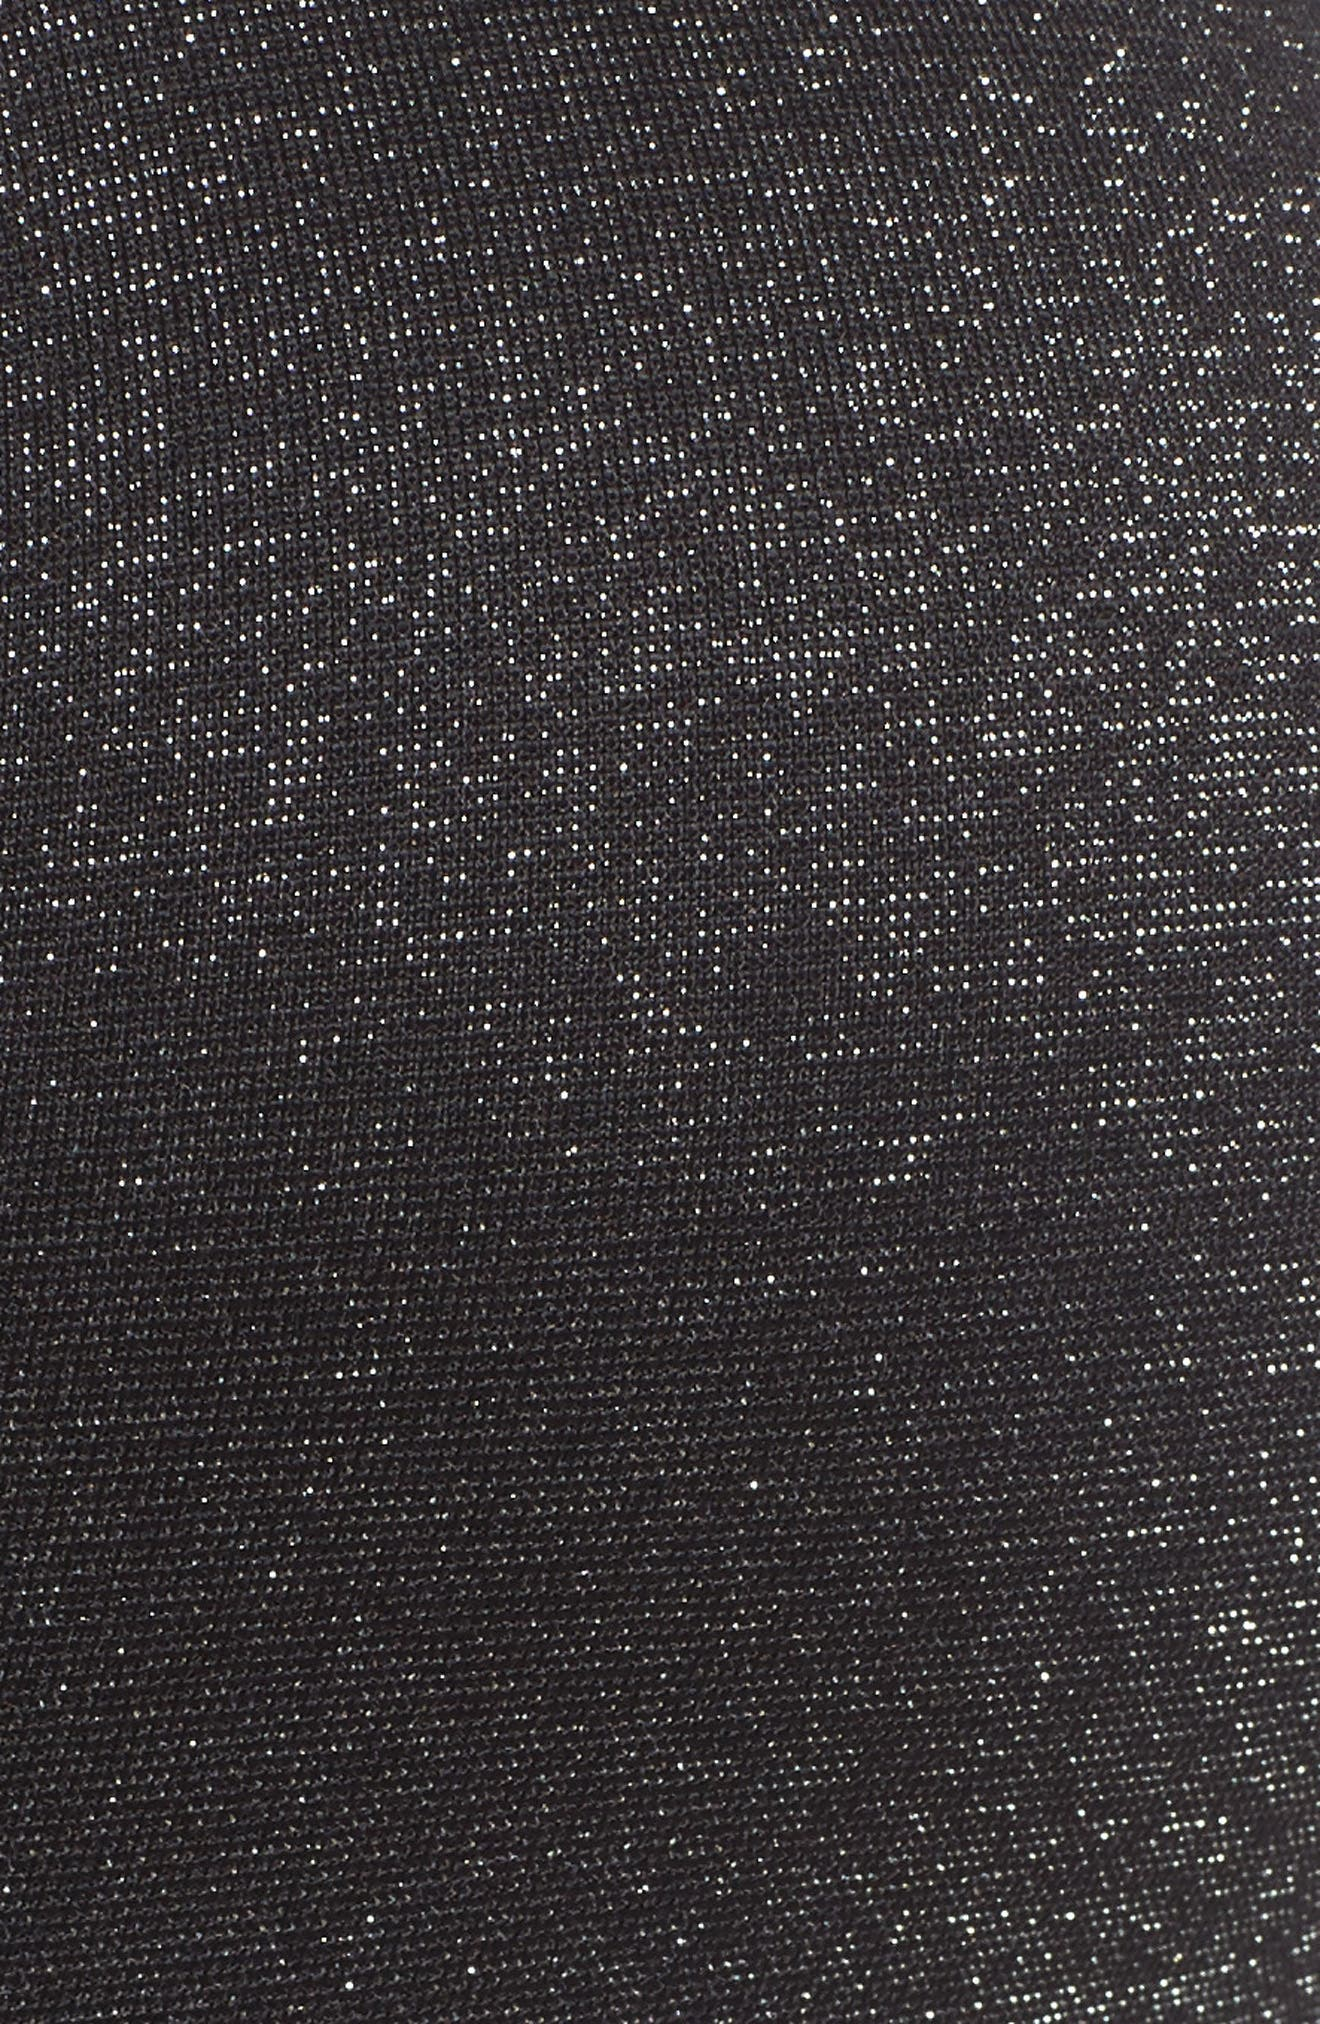 Indy Sparkle Sports Bra,                             Alternate thumbnail 6, color,                             Black/ Metallic Silver/ White